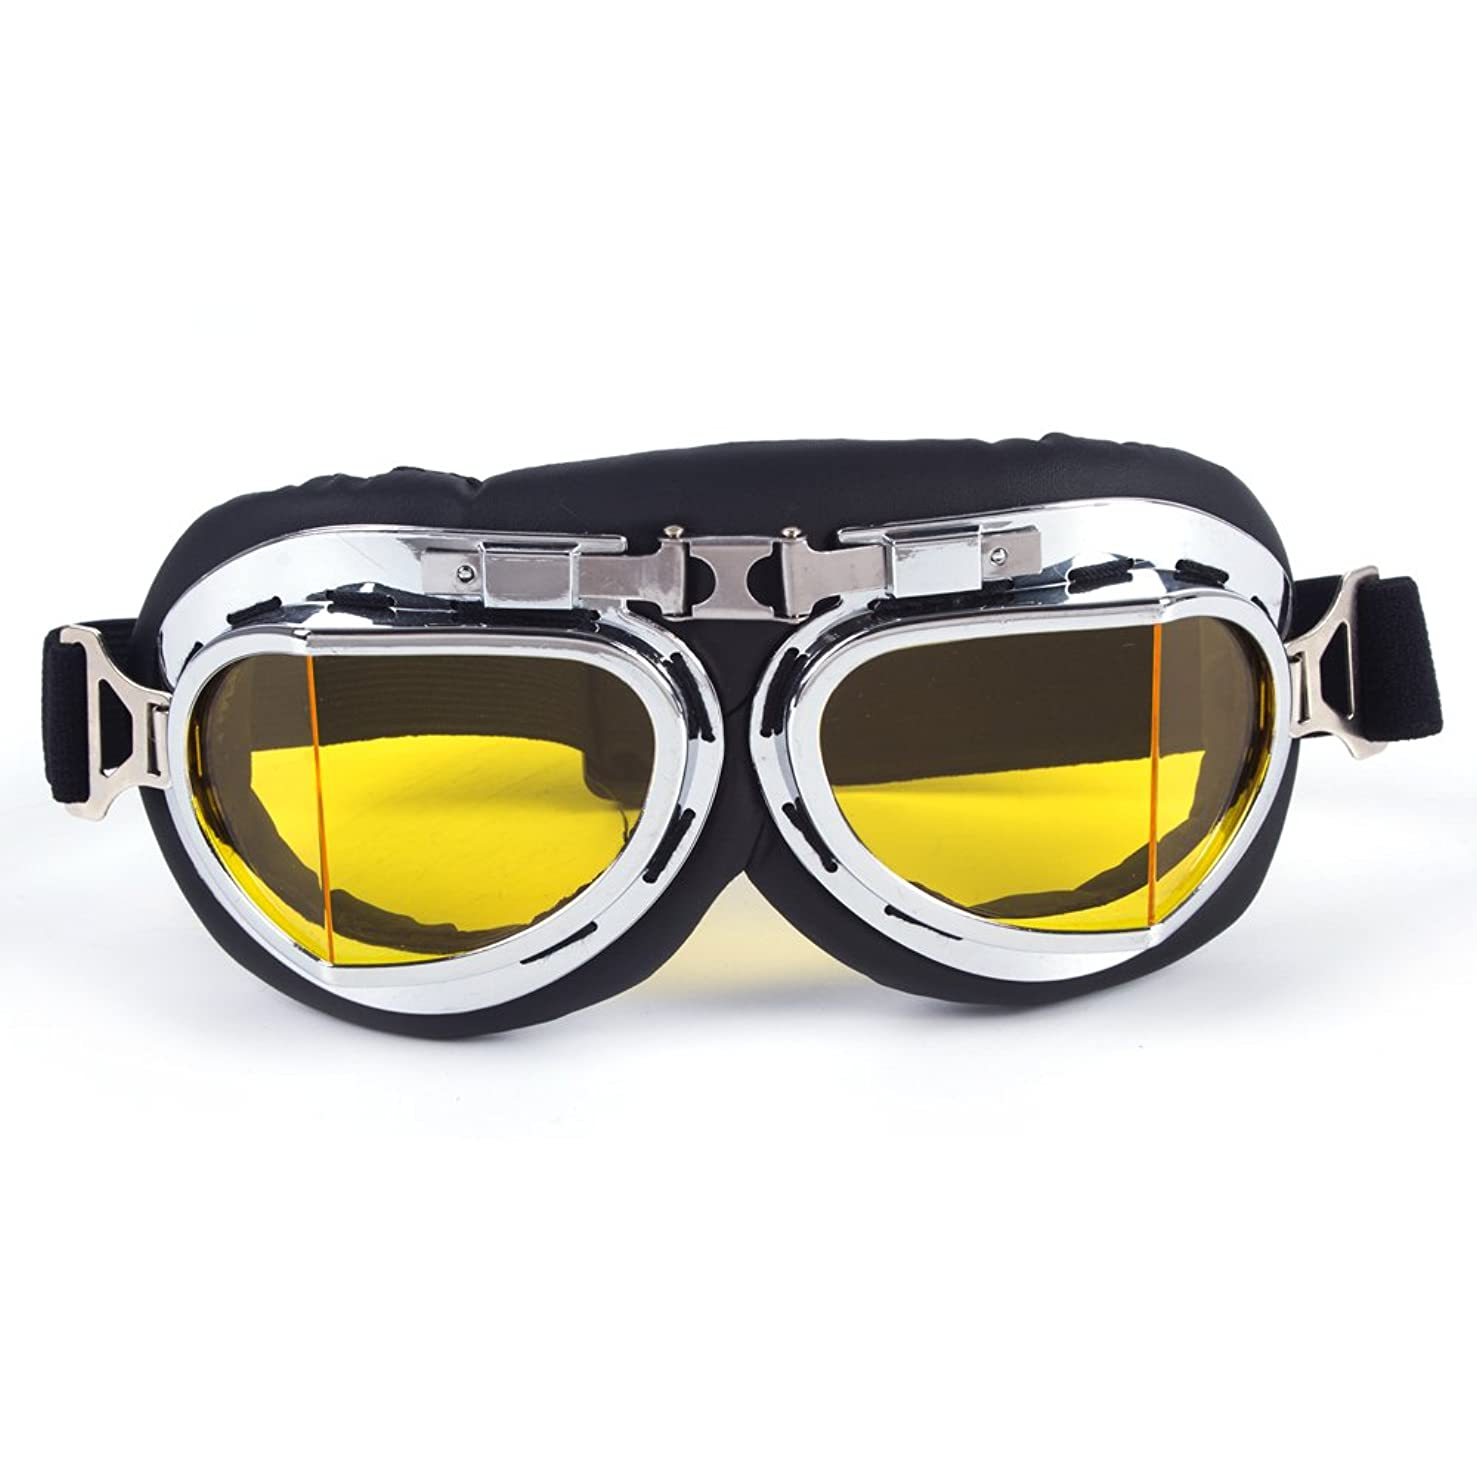 OMG_Shop Ski Snow Motorcycle ATV Off-Road Goggle Eyewear Black Frame Clear Lens